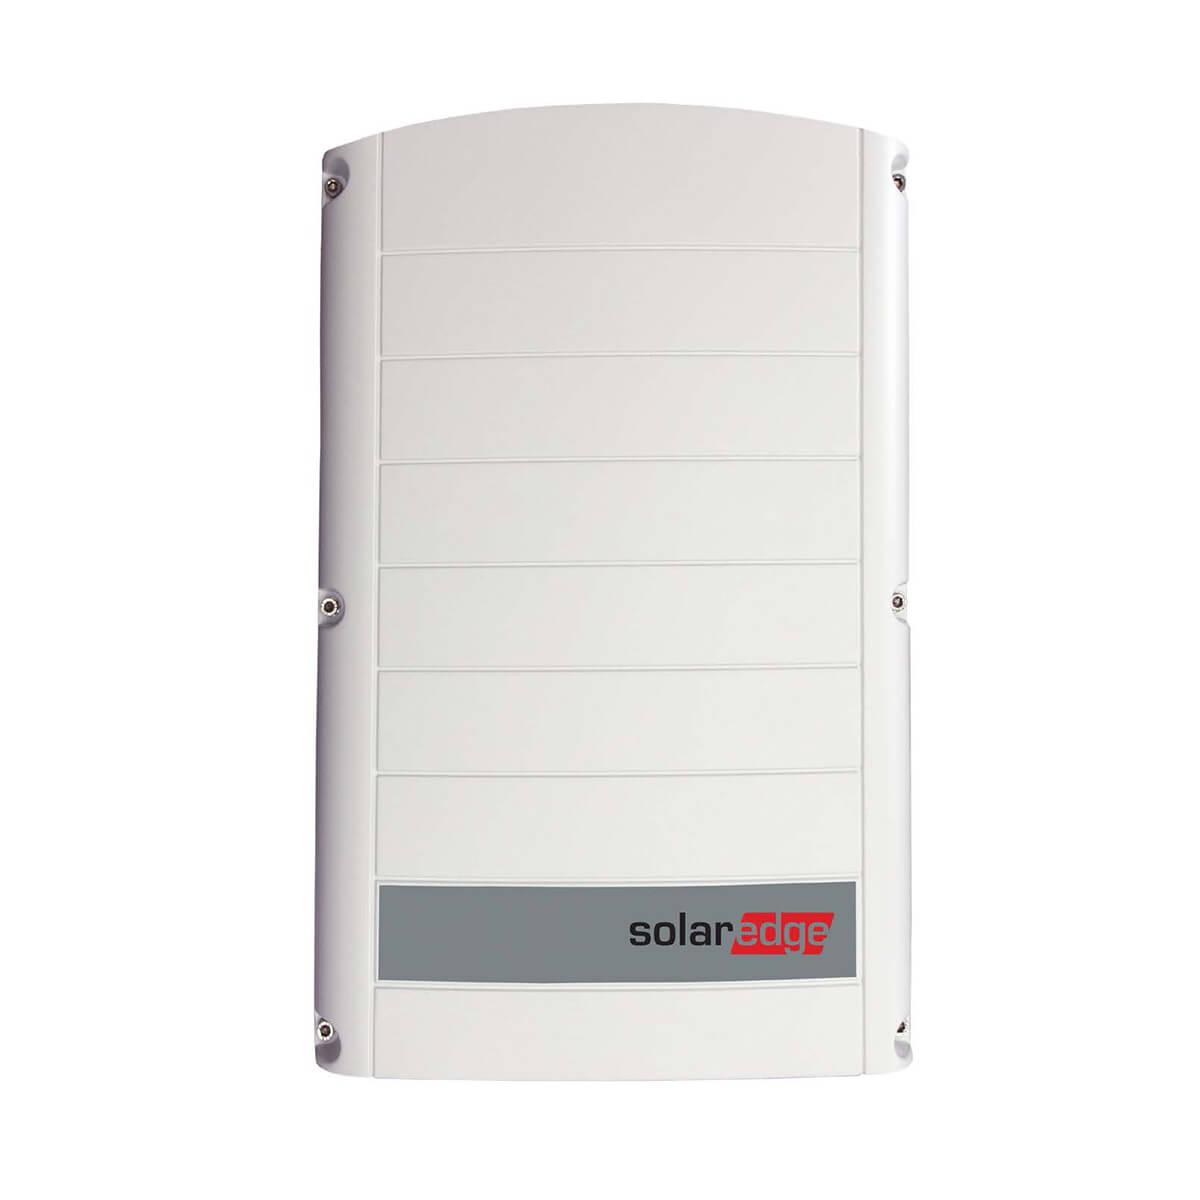 solaredge 12.5kW inverter, solaredge se12.5k 12.5kW inverter, solaredge se12.5k inverter, solaredge se12.5k, solaredge 12.5 kW